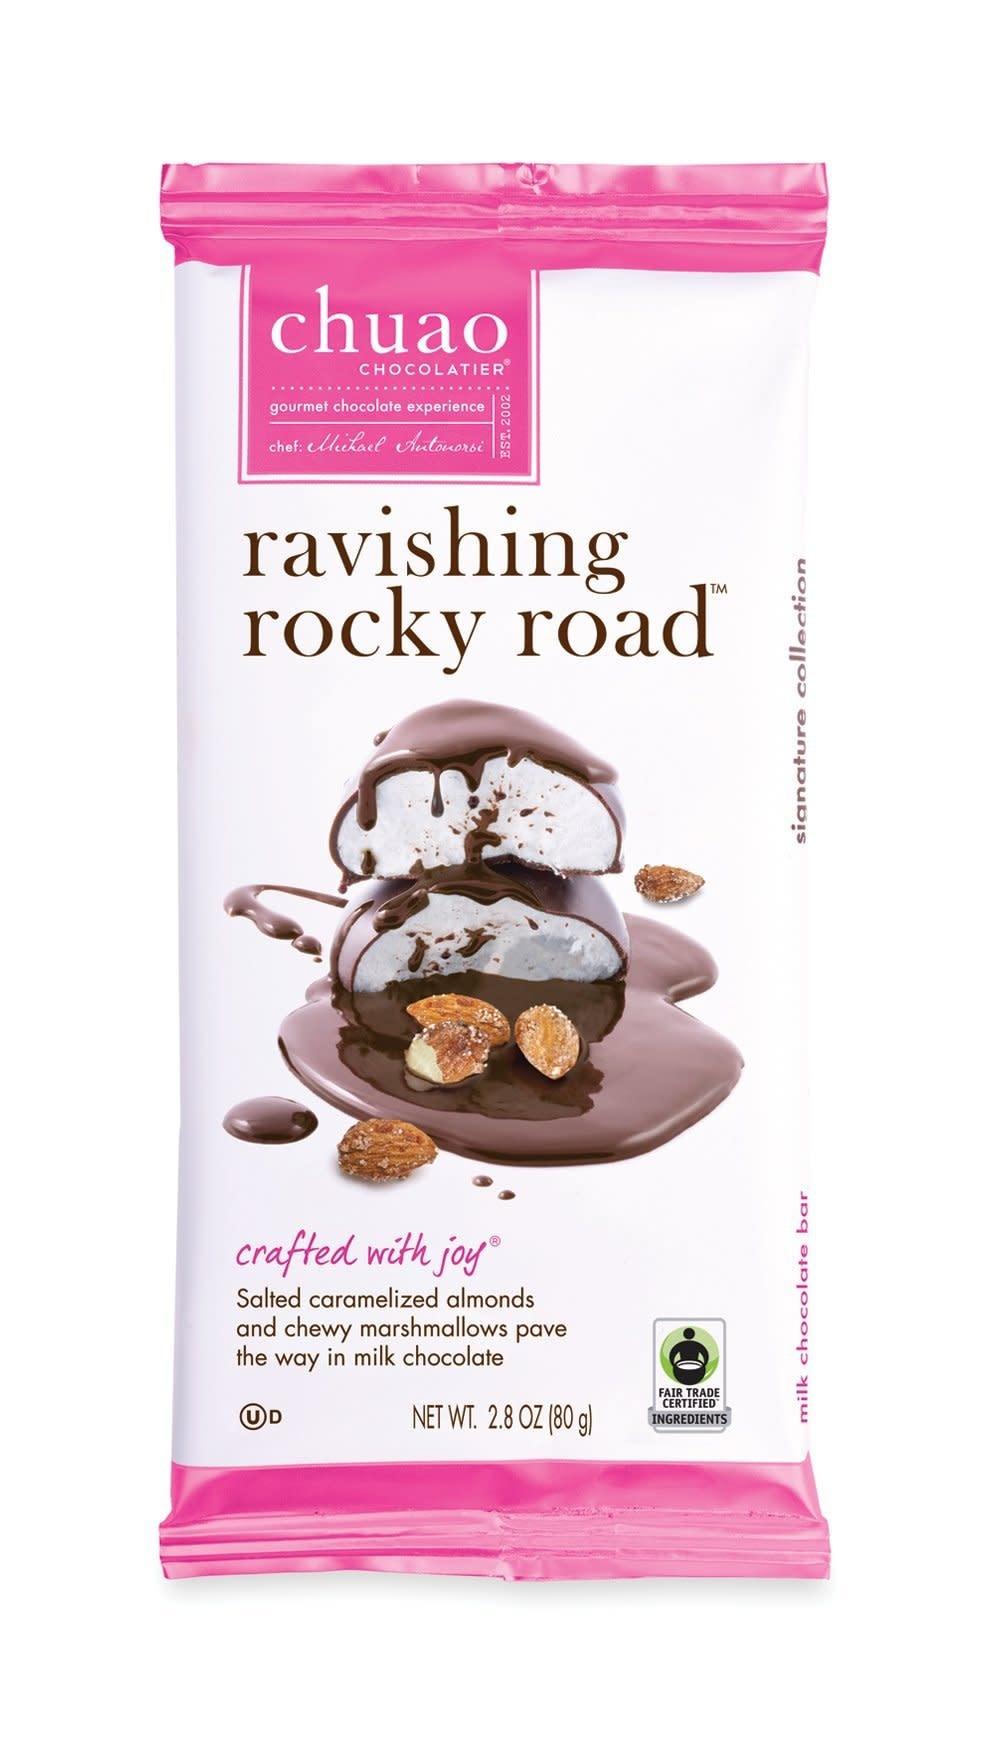 Chuao Ravishing Rocky Road Chocolate Bar, Carlsbad, CA